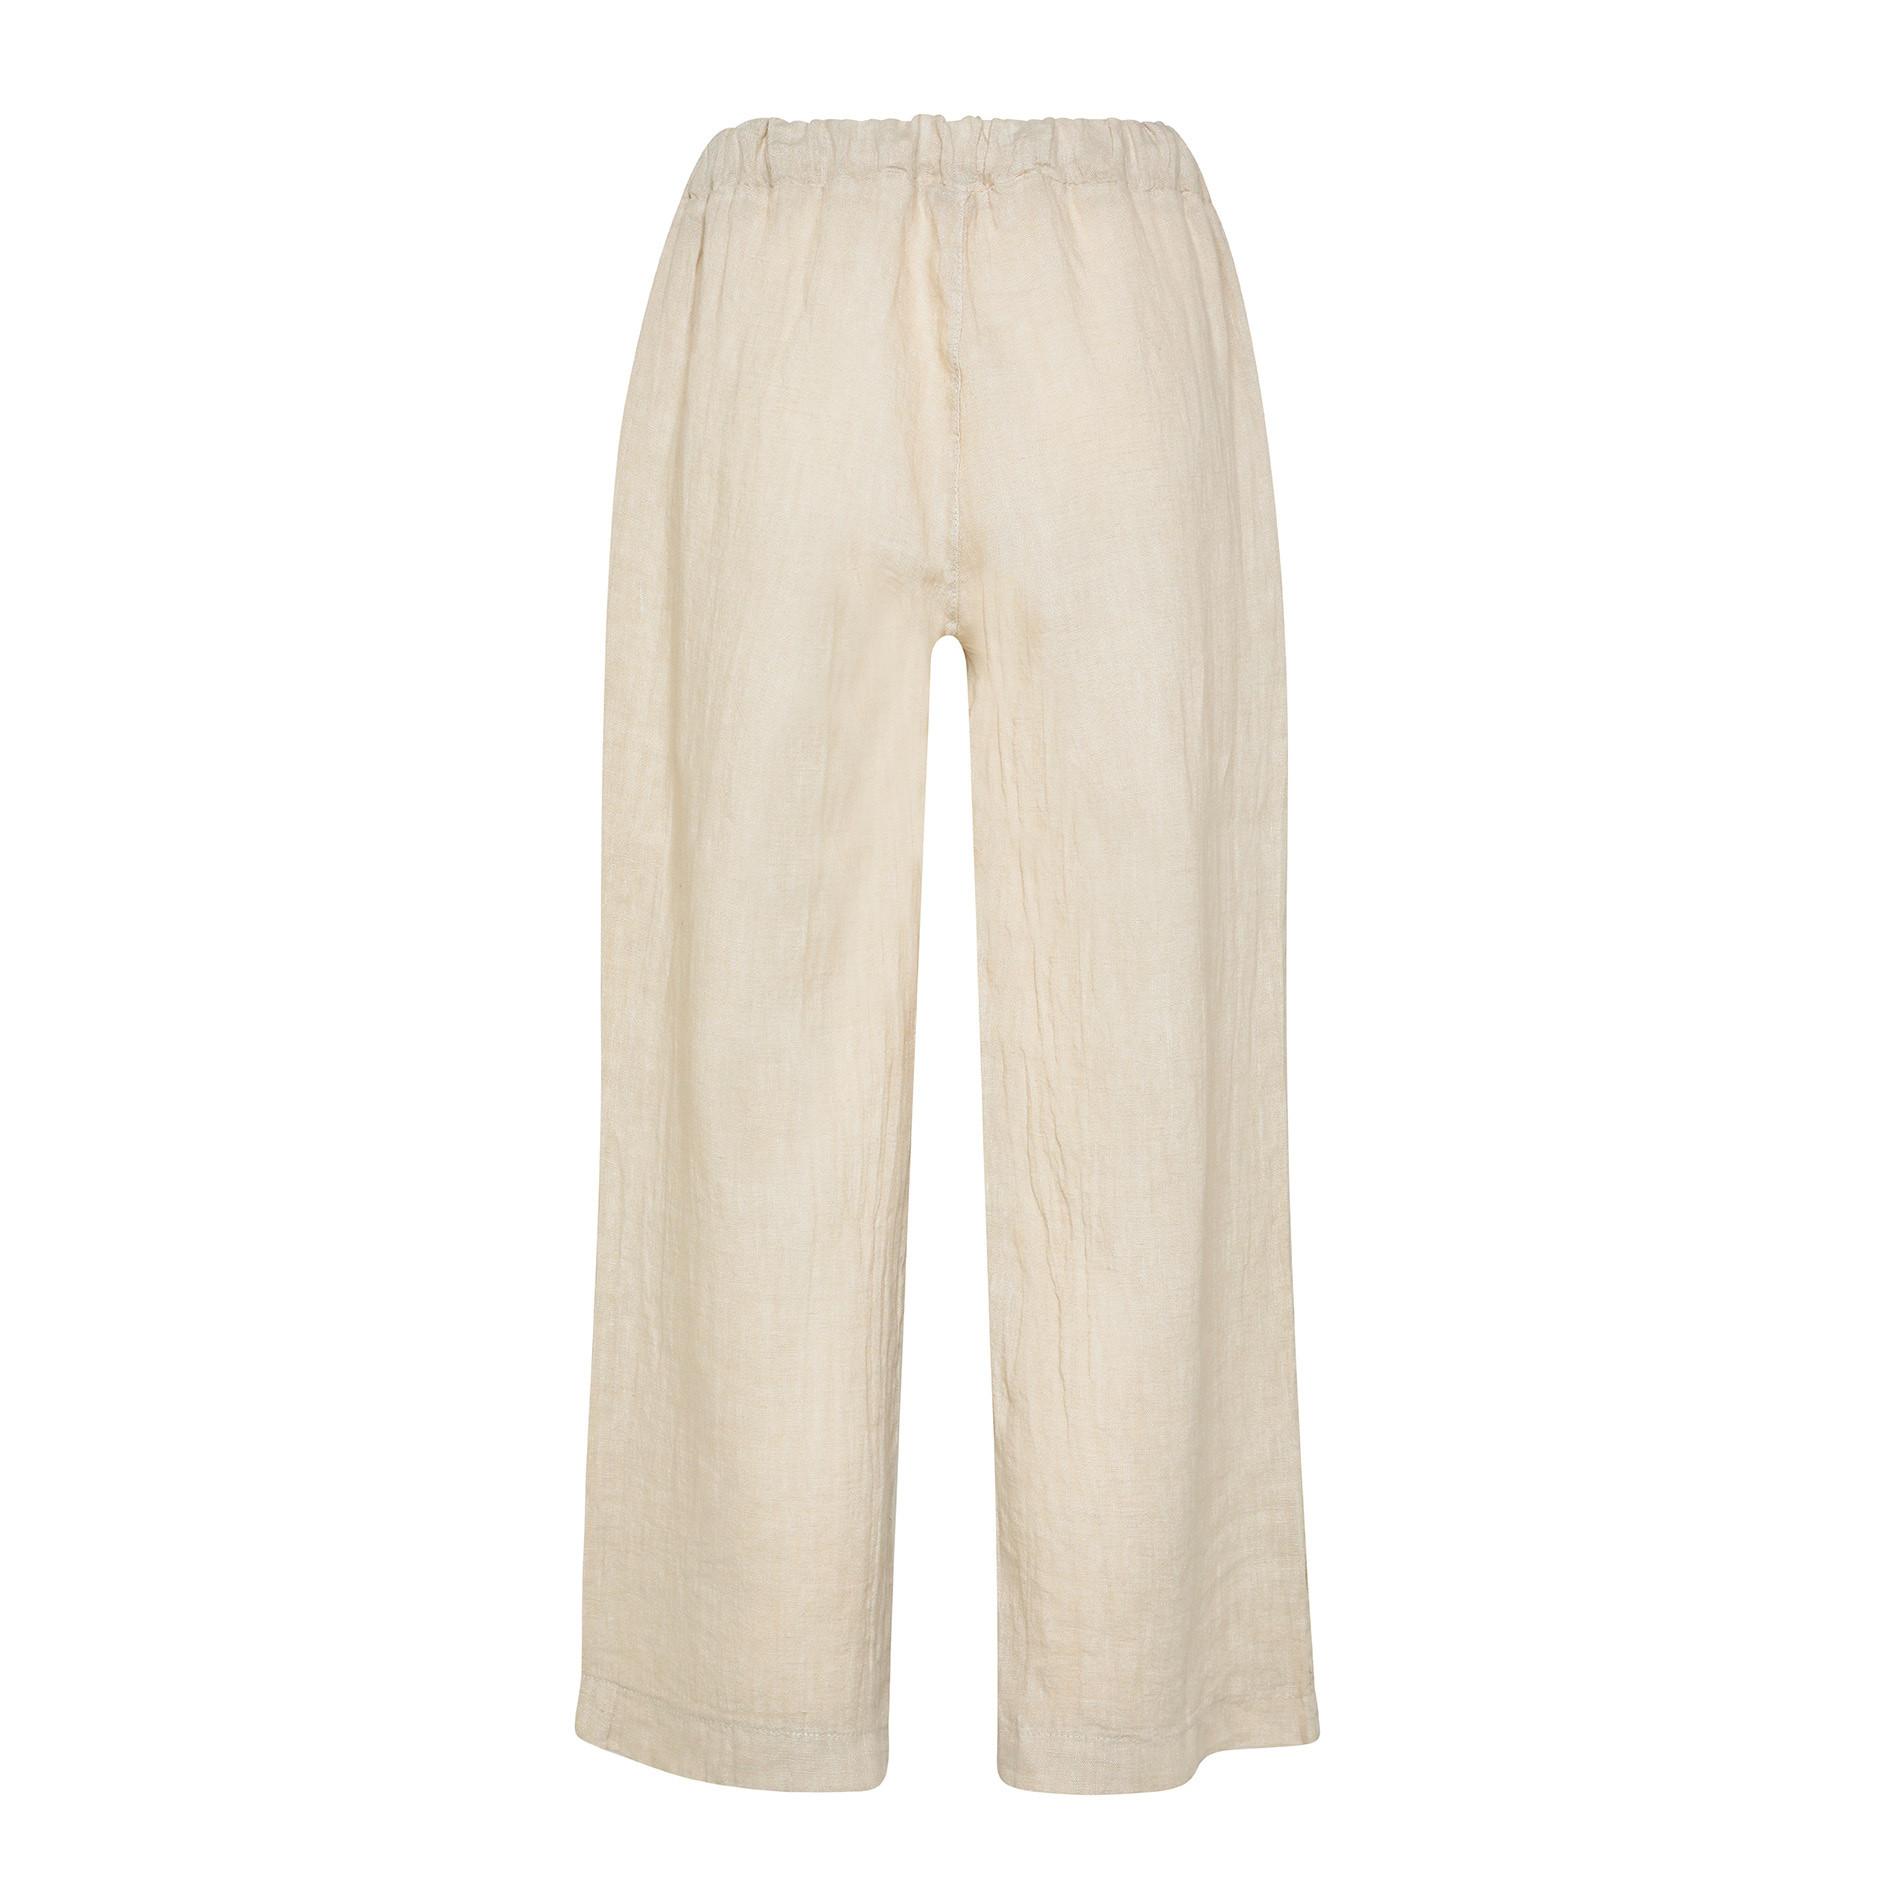 Pantalone ampio in puro lino tinta unita, Beige, large image number 1